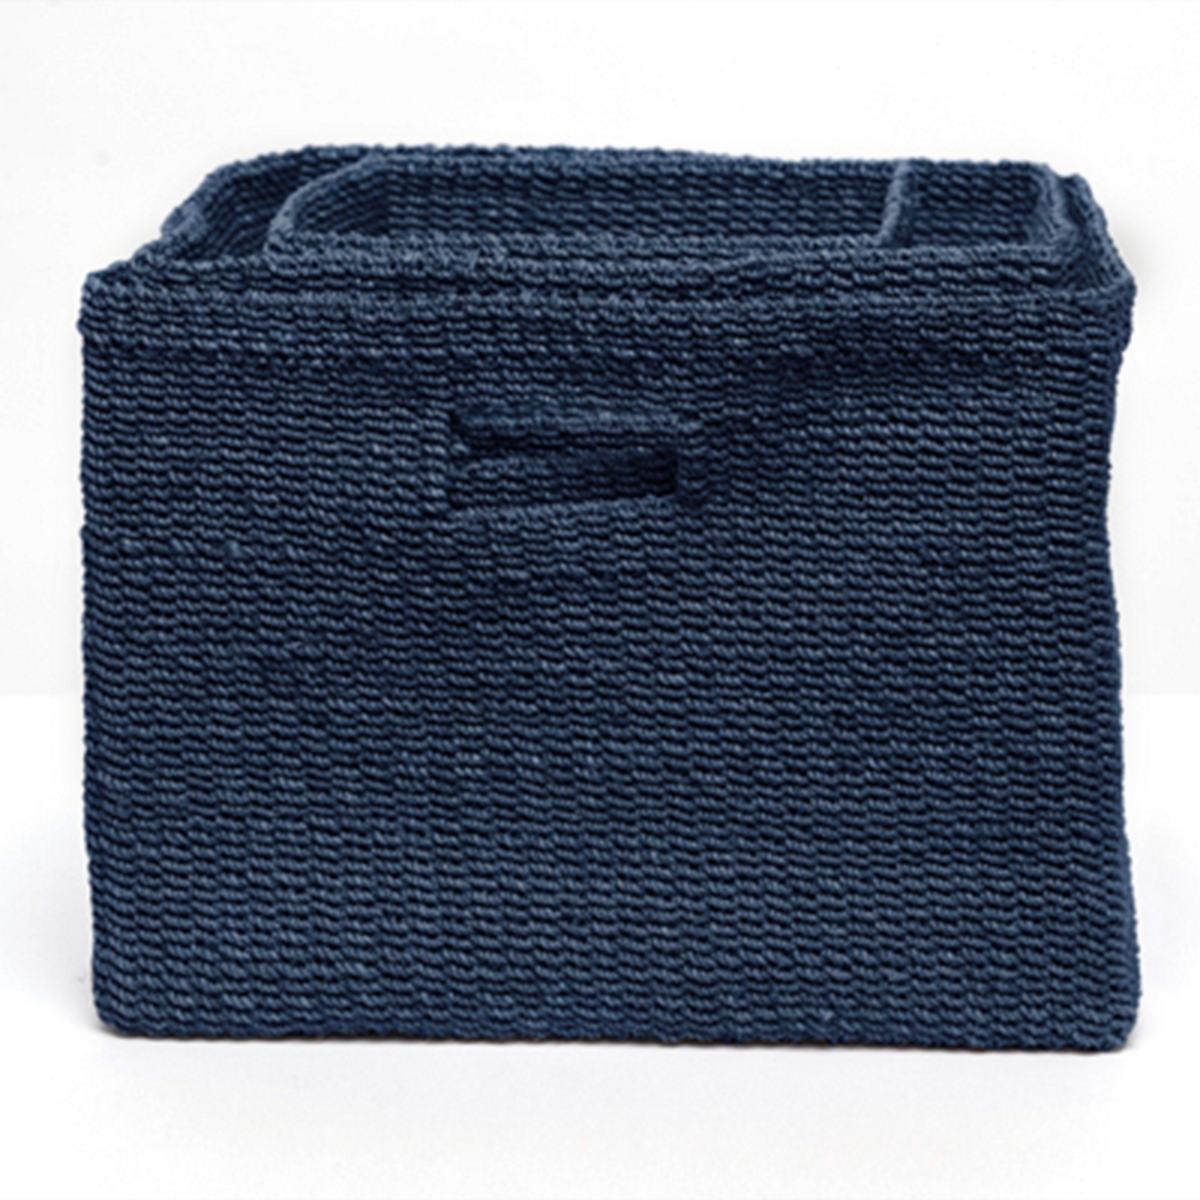 Indigo Blue Lindon Baskets/Set Of 3